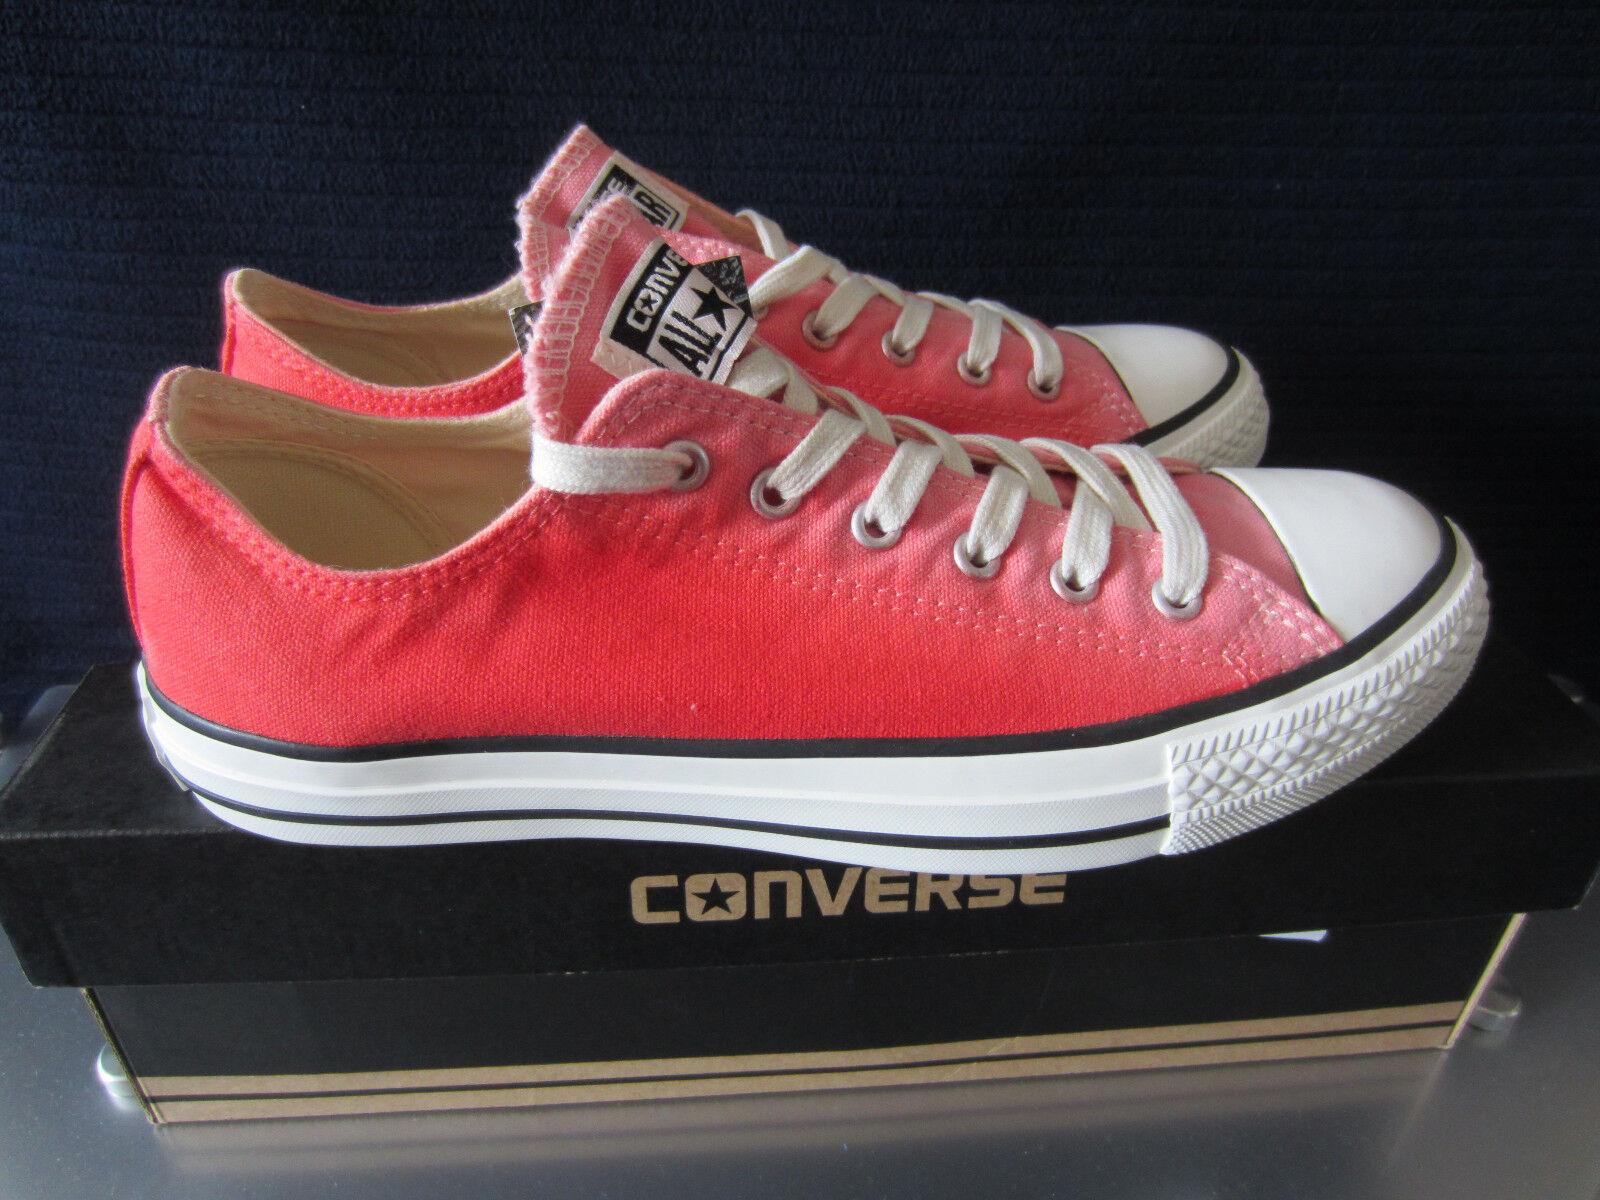 Converse Converse Converse CHUCK TAYLOR ALL STAR 151266C CTAS OX DAYBREA Sneakers Gr.38. NEU OVP fbc2ca